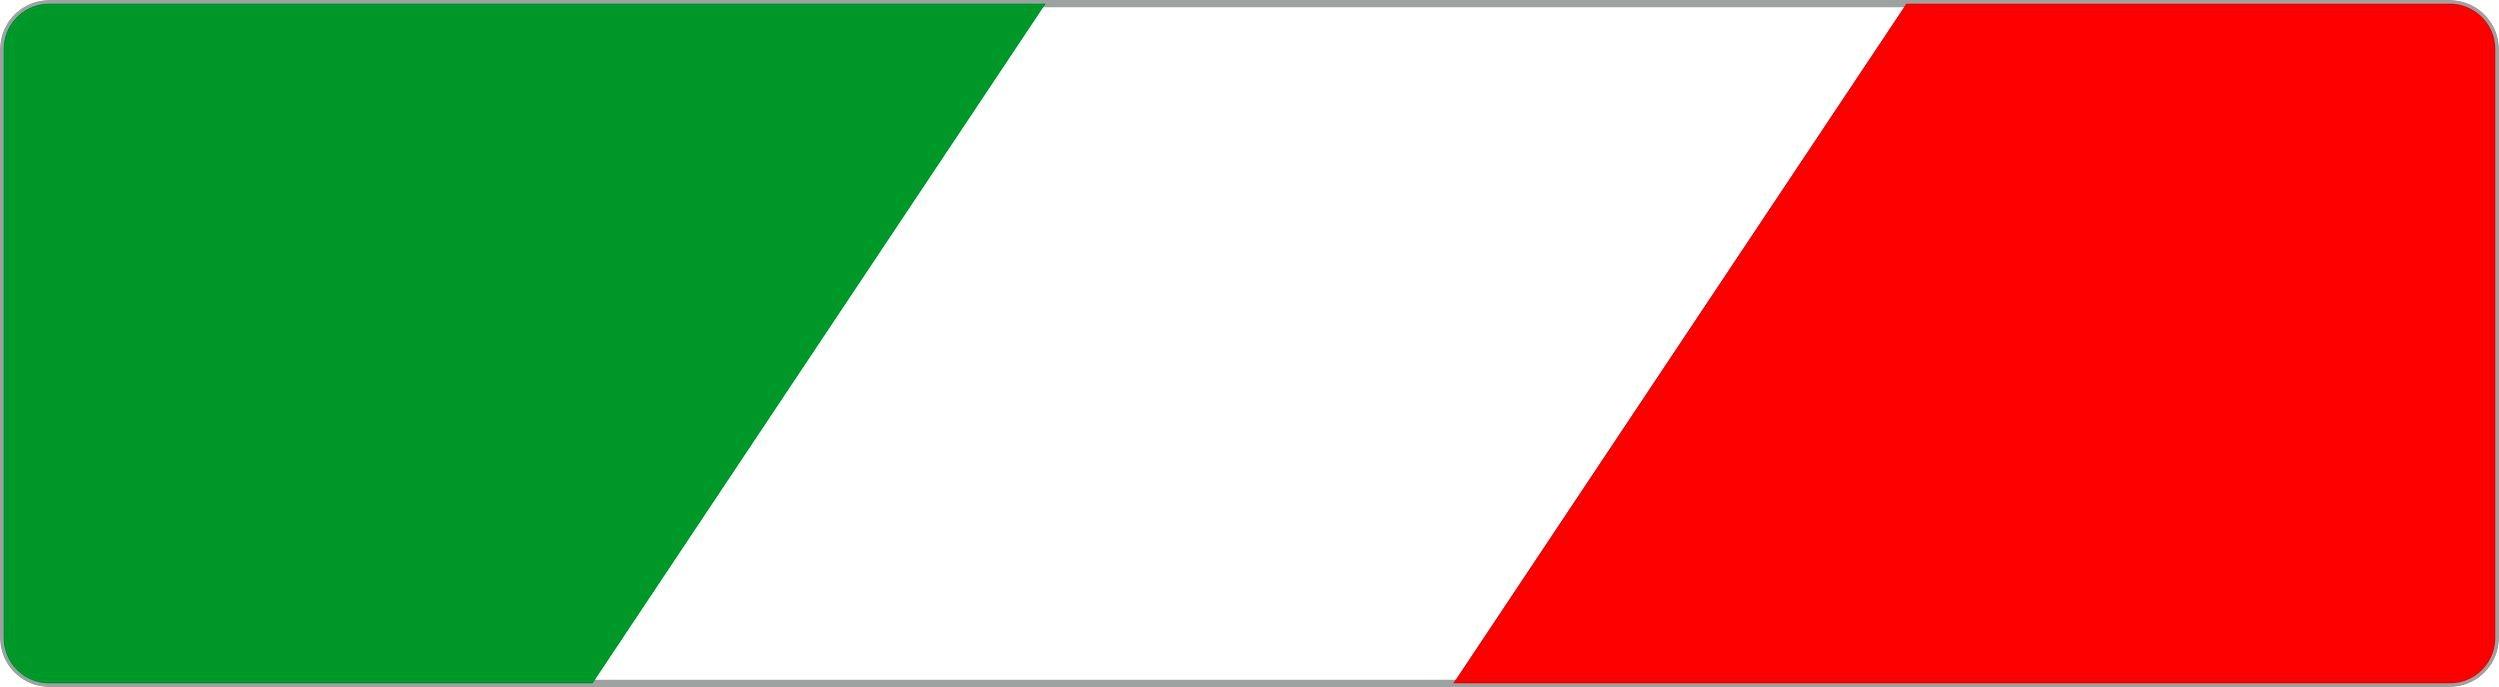 Aufkleber Italien Flagge Dimension 15 x 55 mm Deutschland Fanartikel Olympia – Bild 1